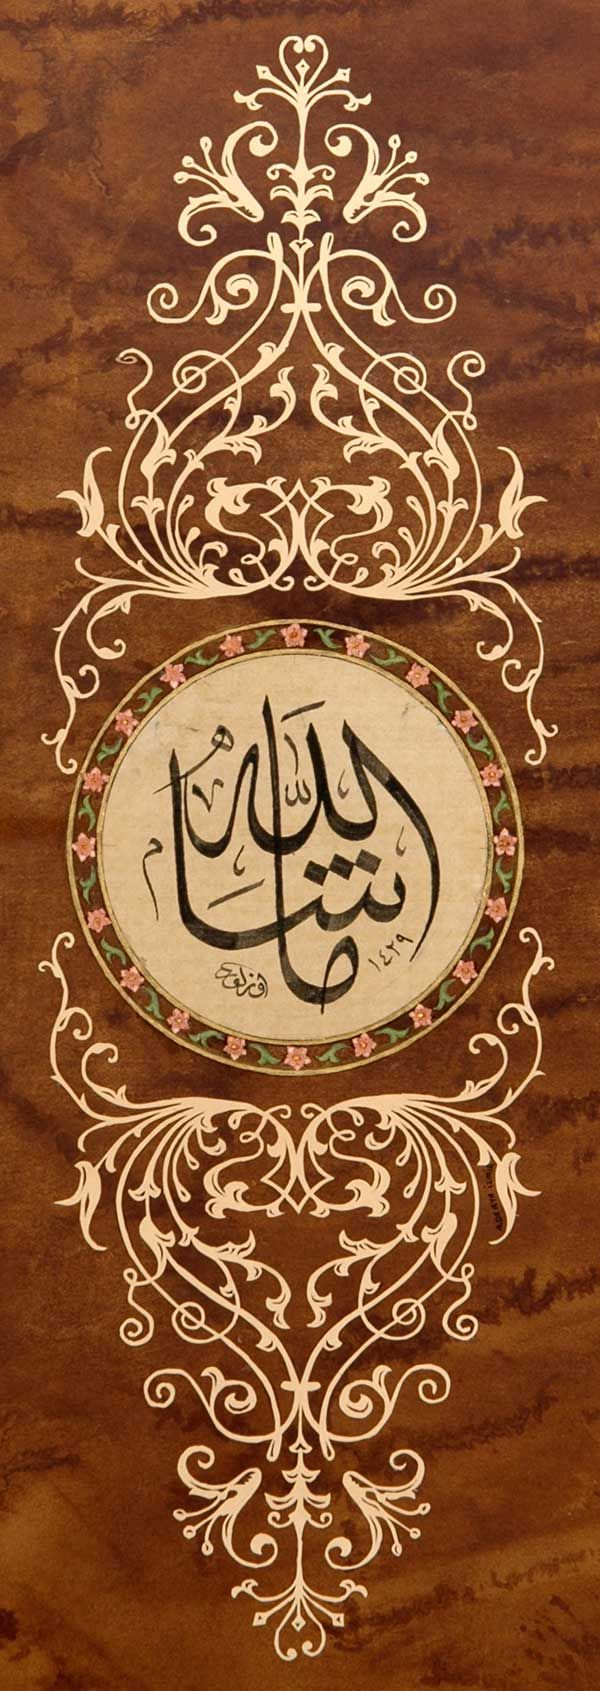 DesertRose///Masha'allah calligraphy art